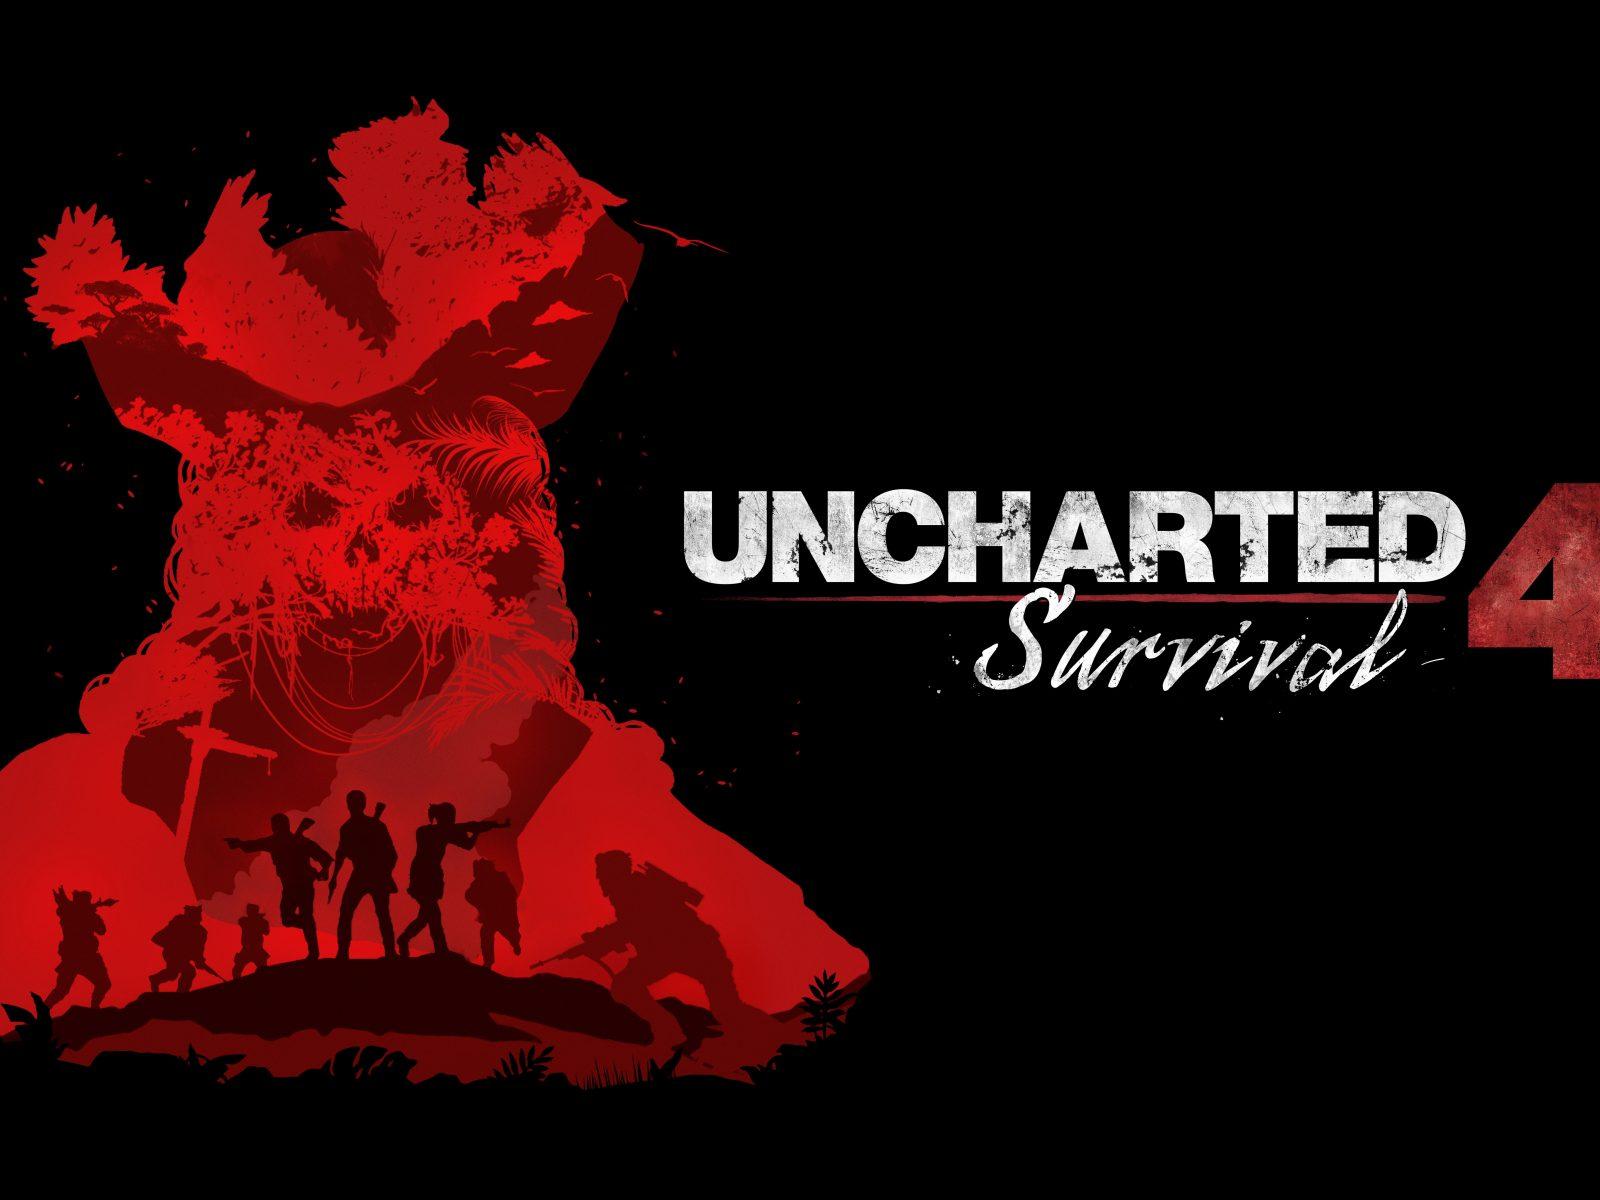 Uncharted 4 Survival 4k 8k Wallpaper Hd Wallpaper Background